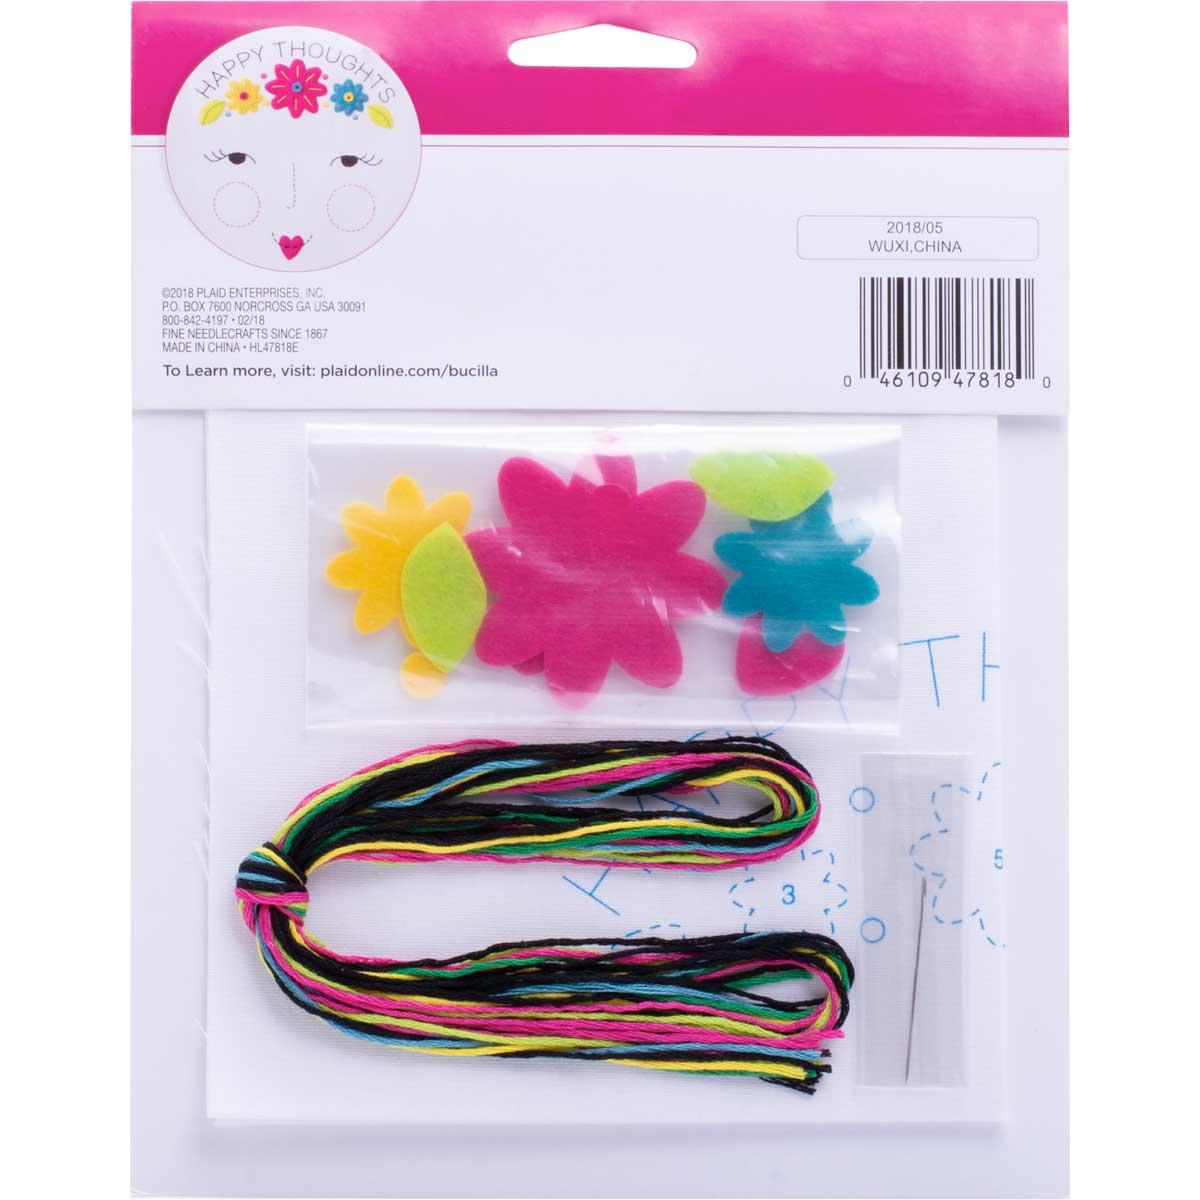 Bucilla ® My 1st Stitch™ - Stamped Cross Stitch Kits - Happy Thoughts